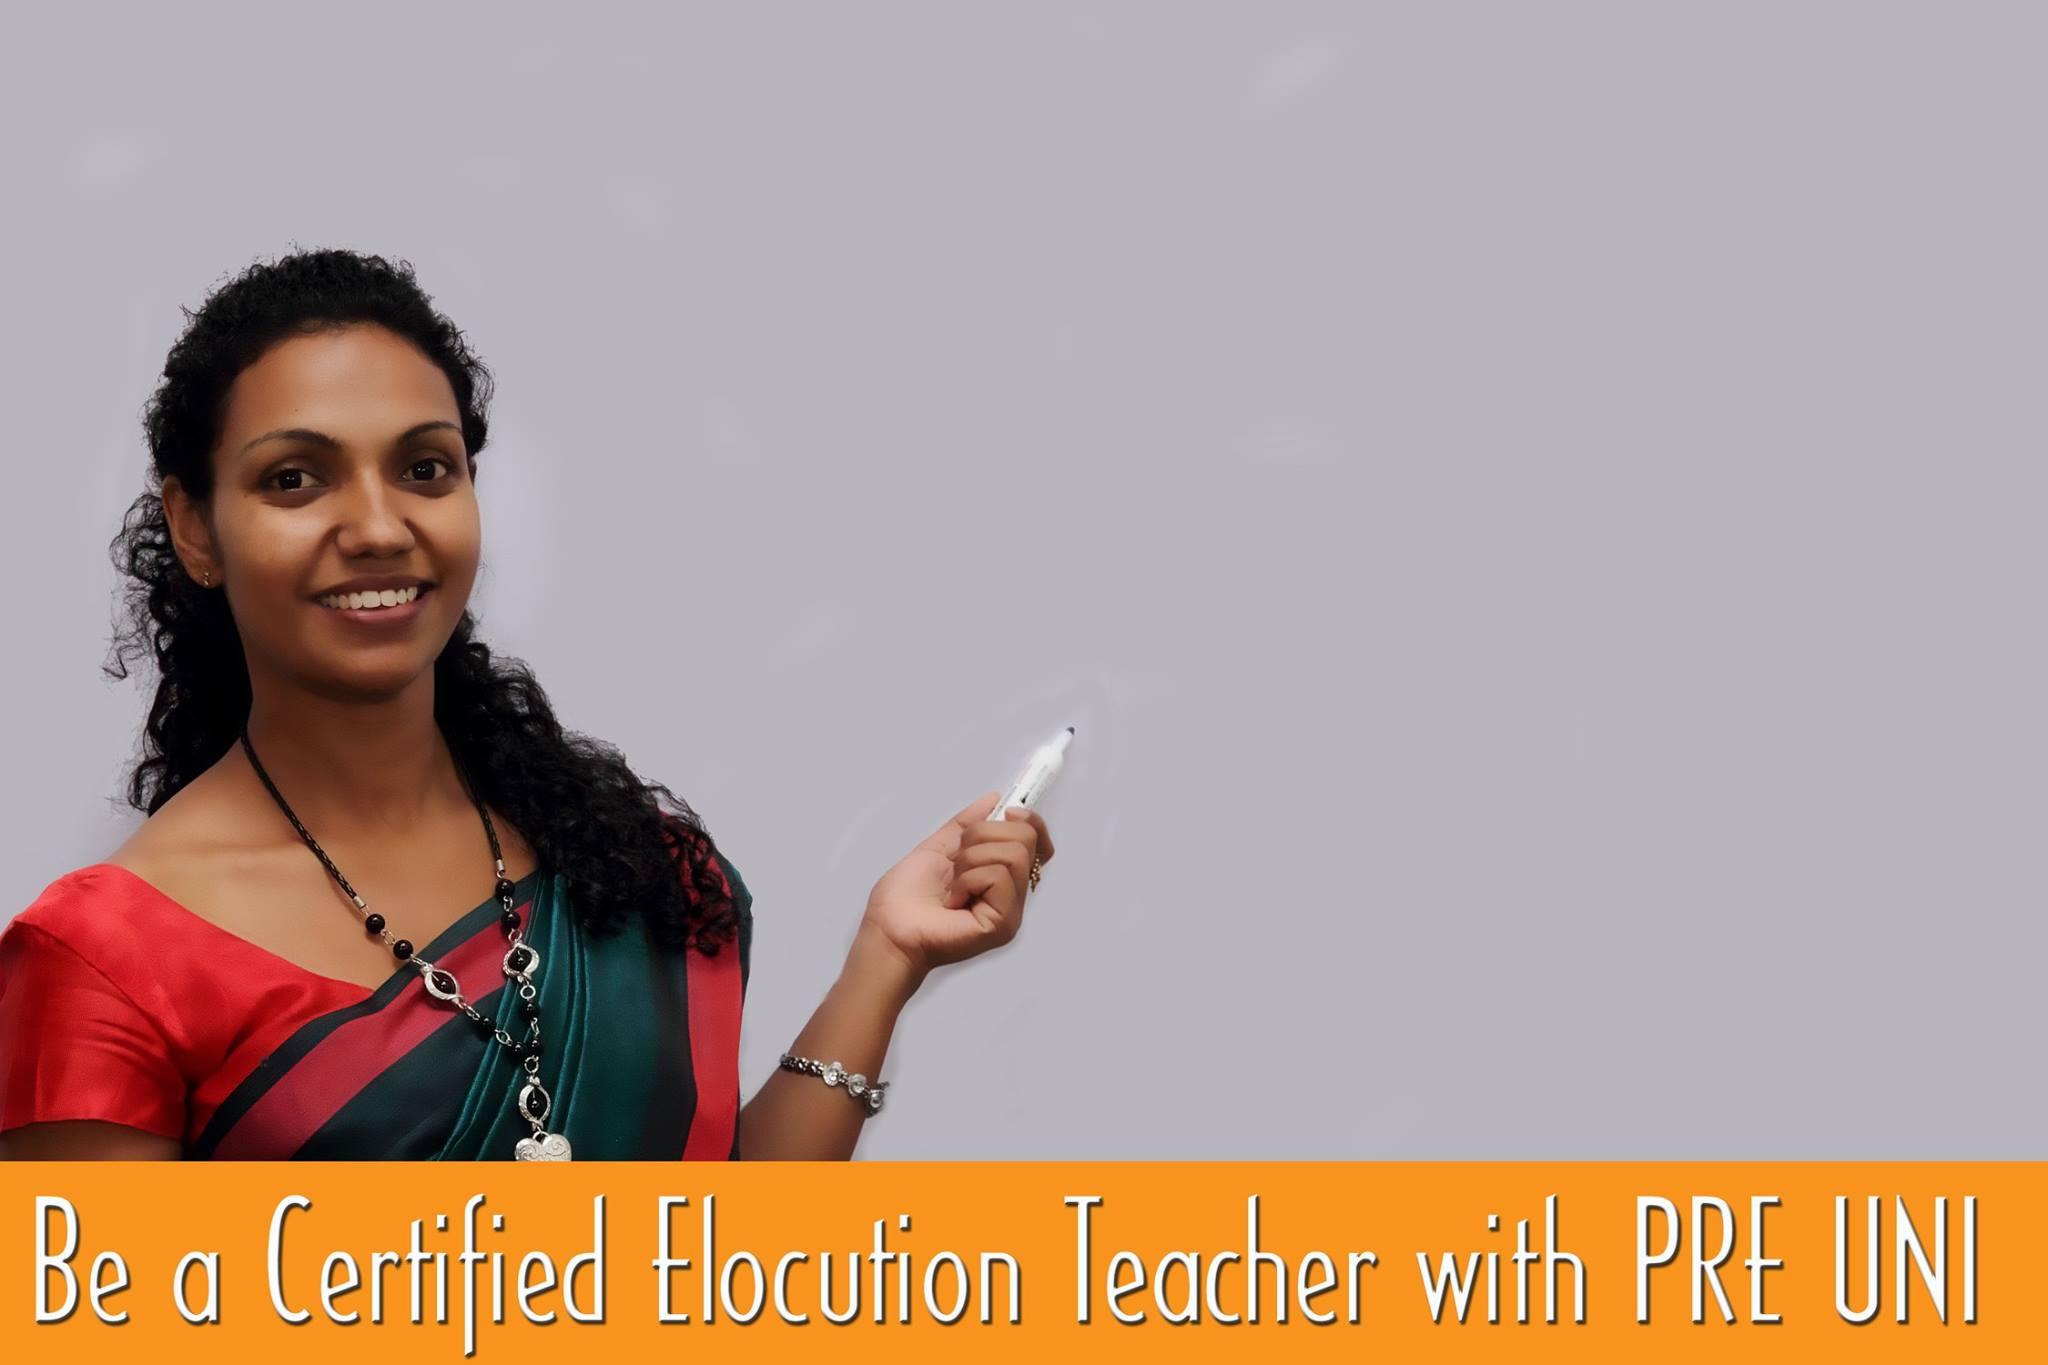 how to become an elocution teacher